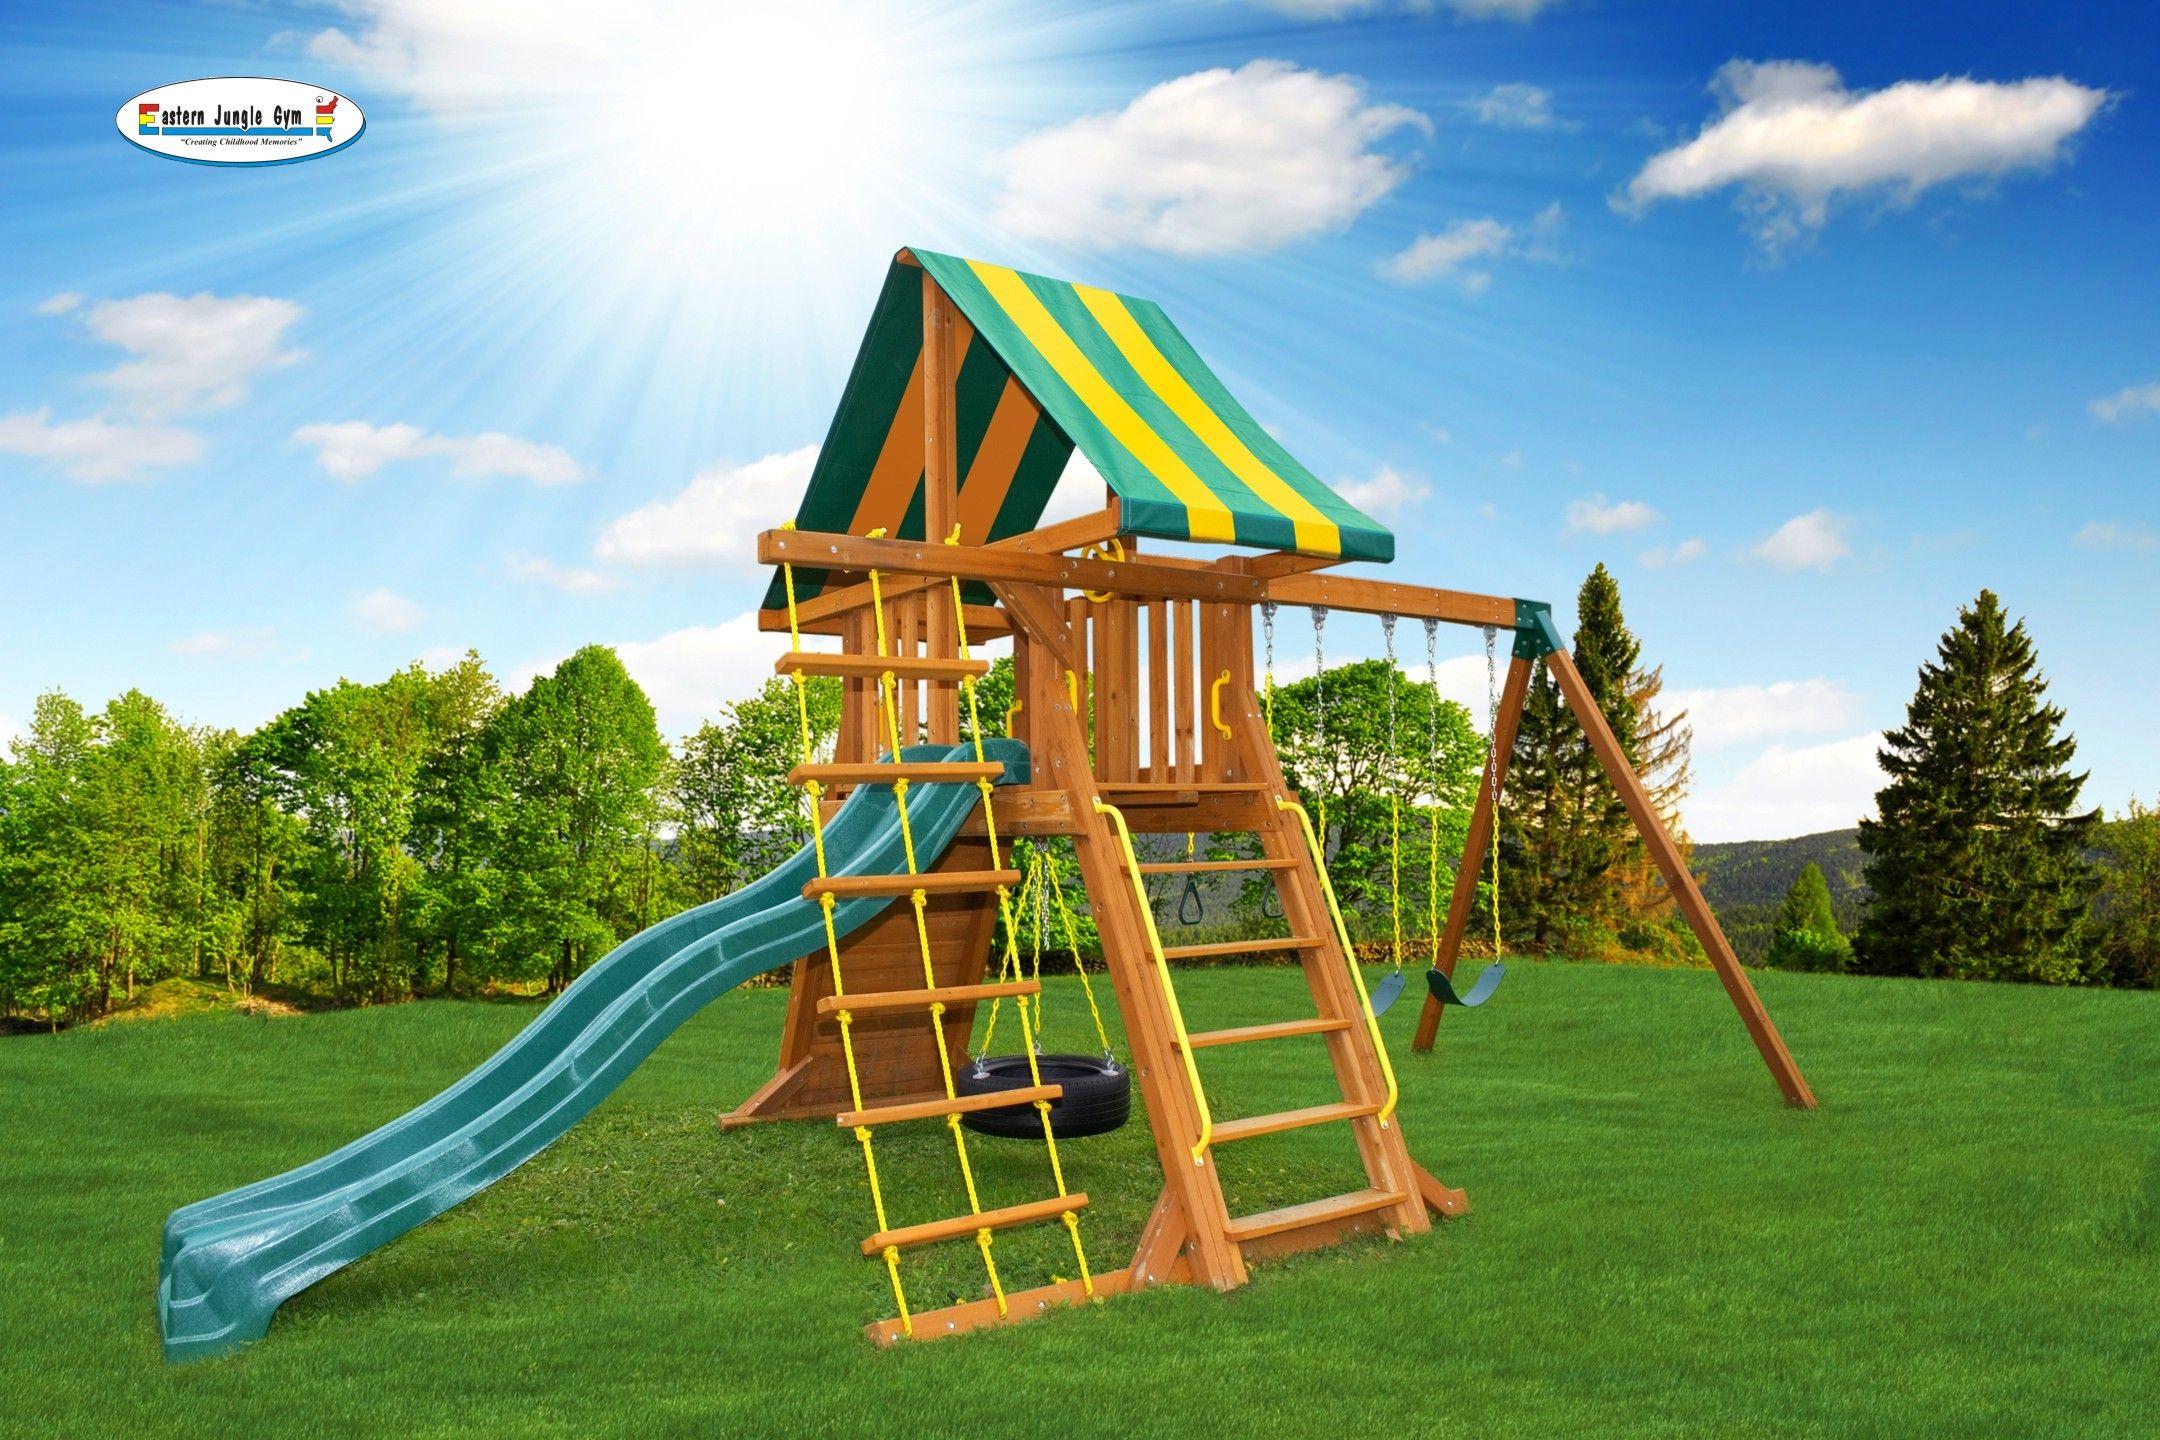 supremescape swing set 1 wooden swing sets pinterest jungle gym